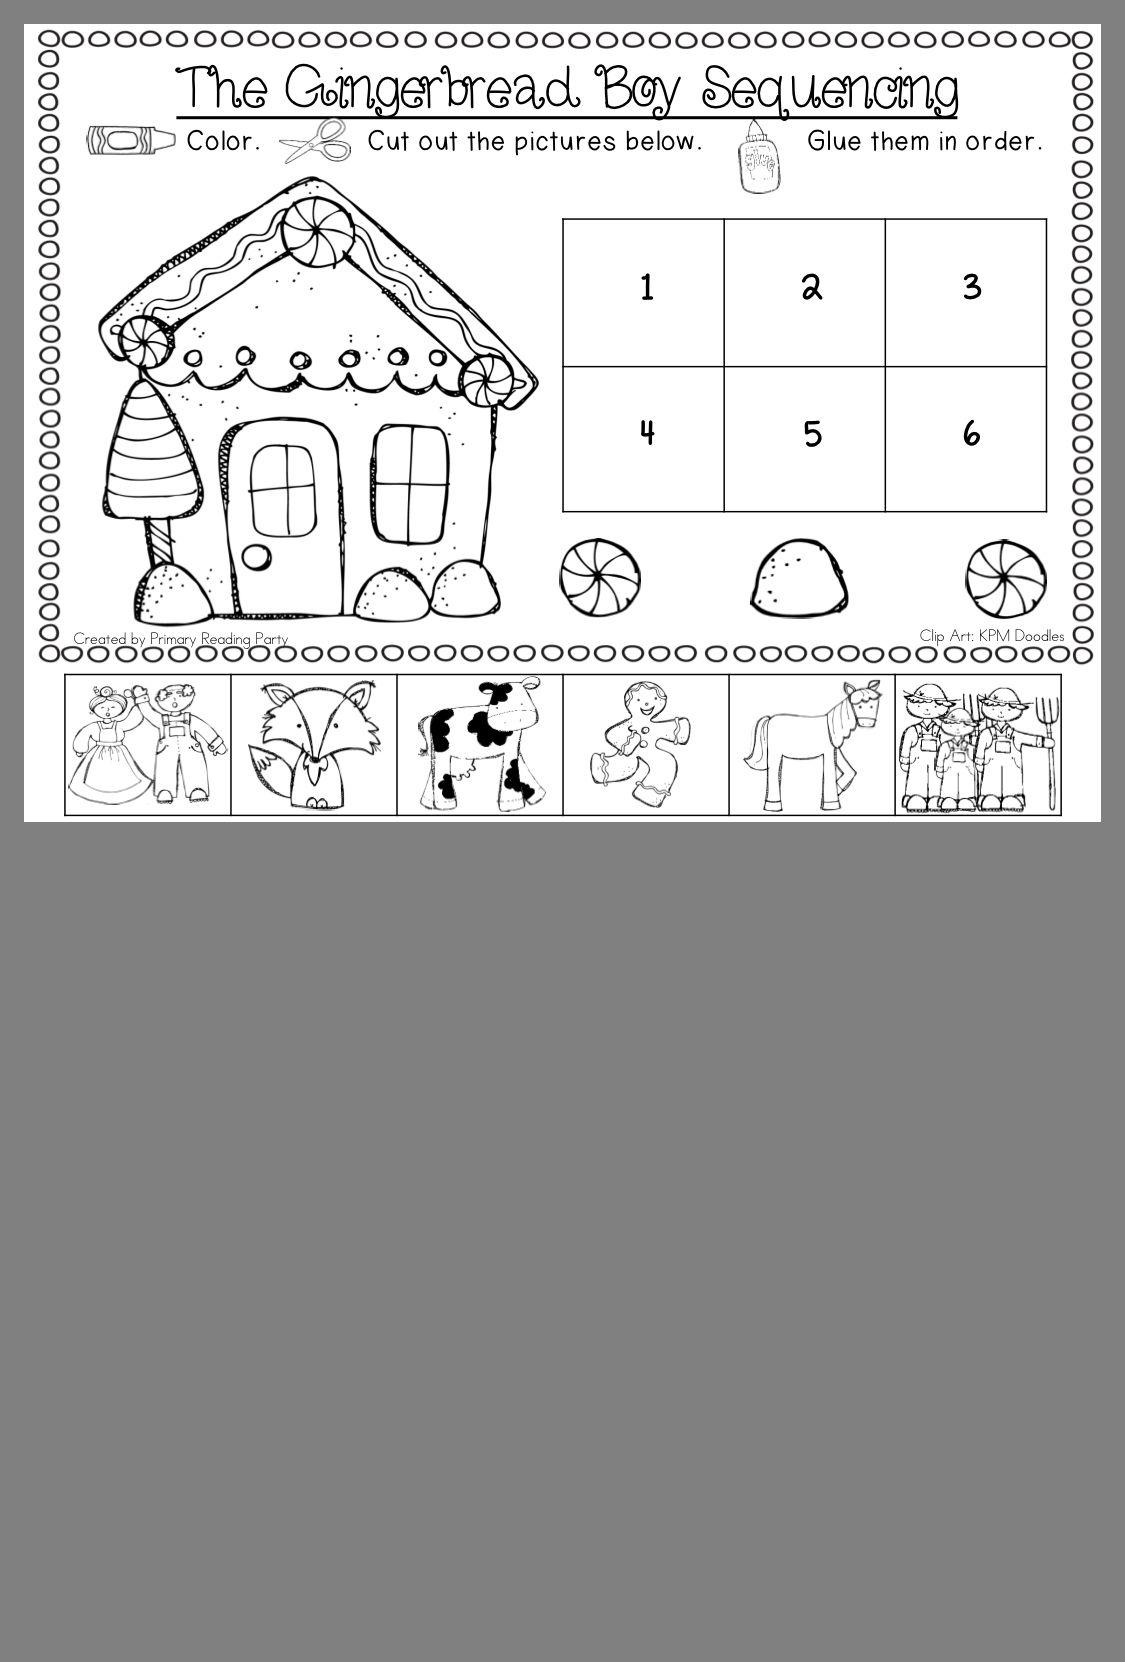 Pin By Florence Fencer On Preschool Activities Winter Unit Preschool Teaching Preschool Homeschool Reading [ 1662 x 1125 Pixel ]